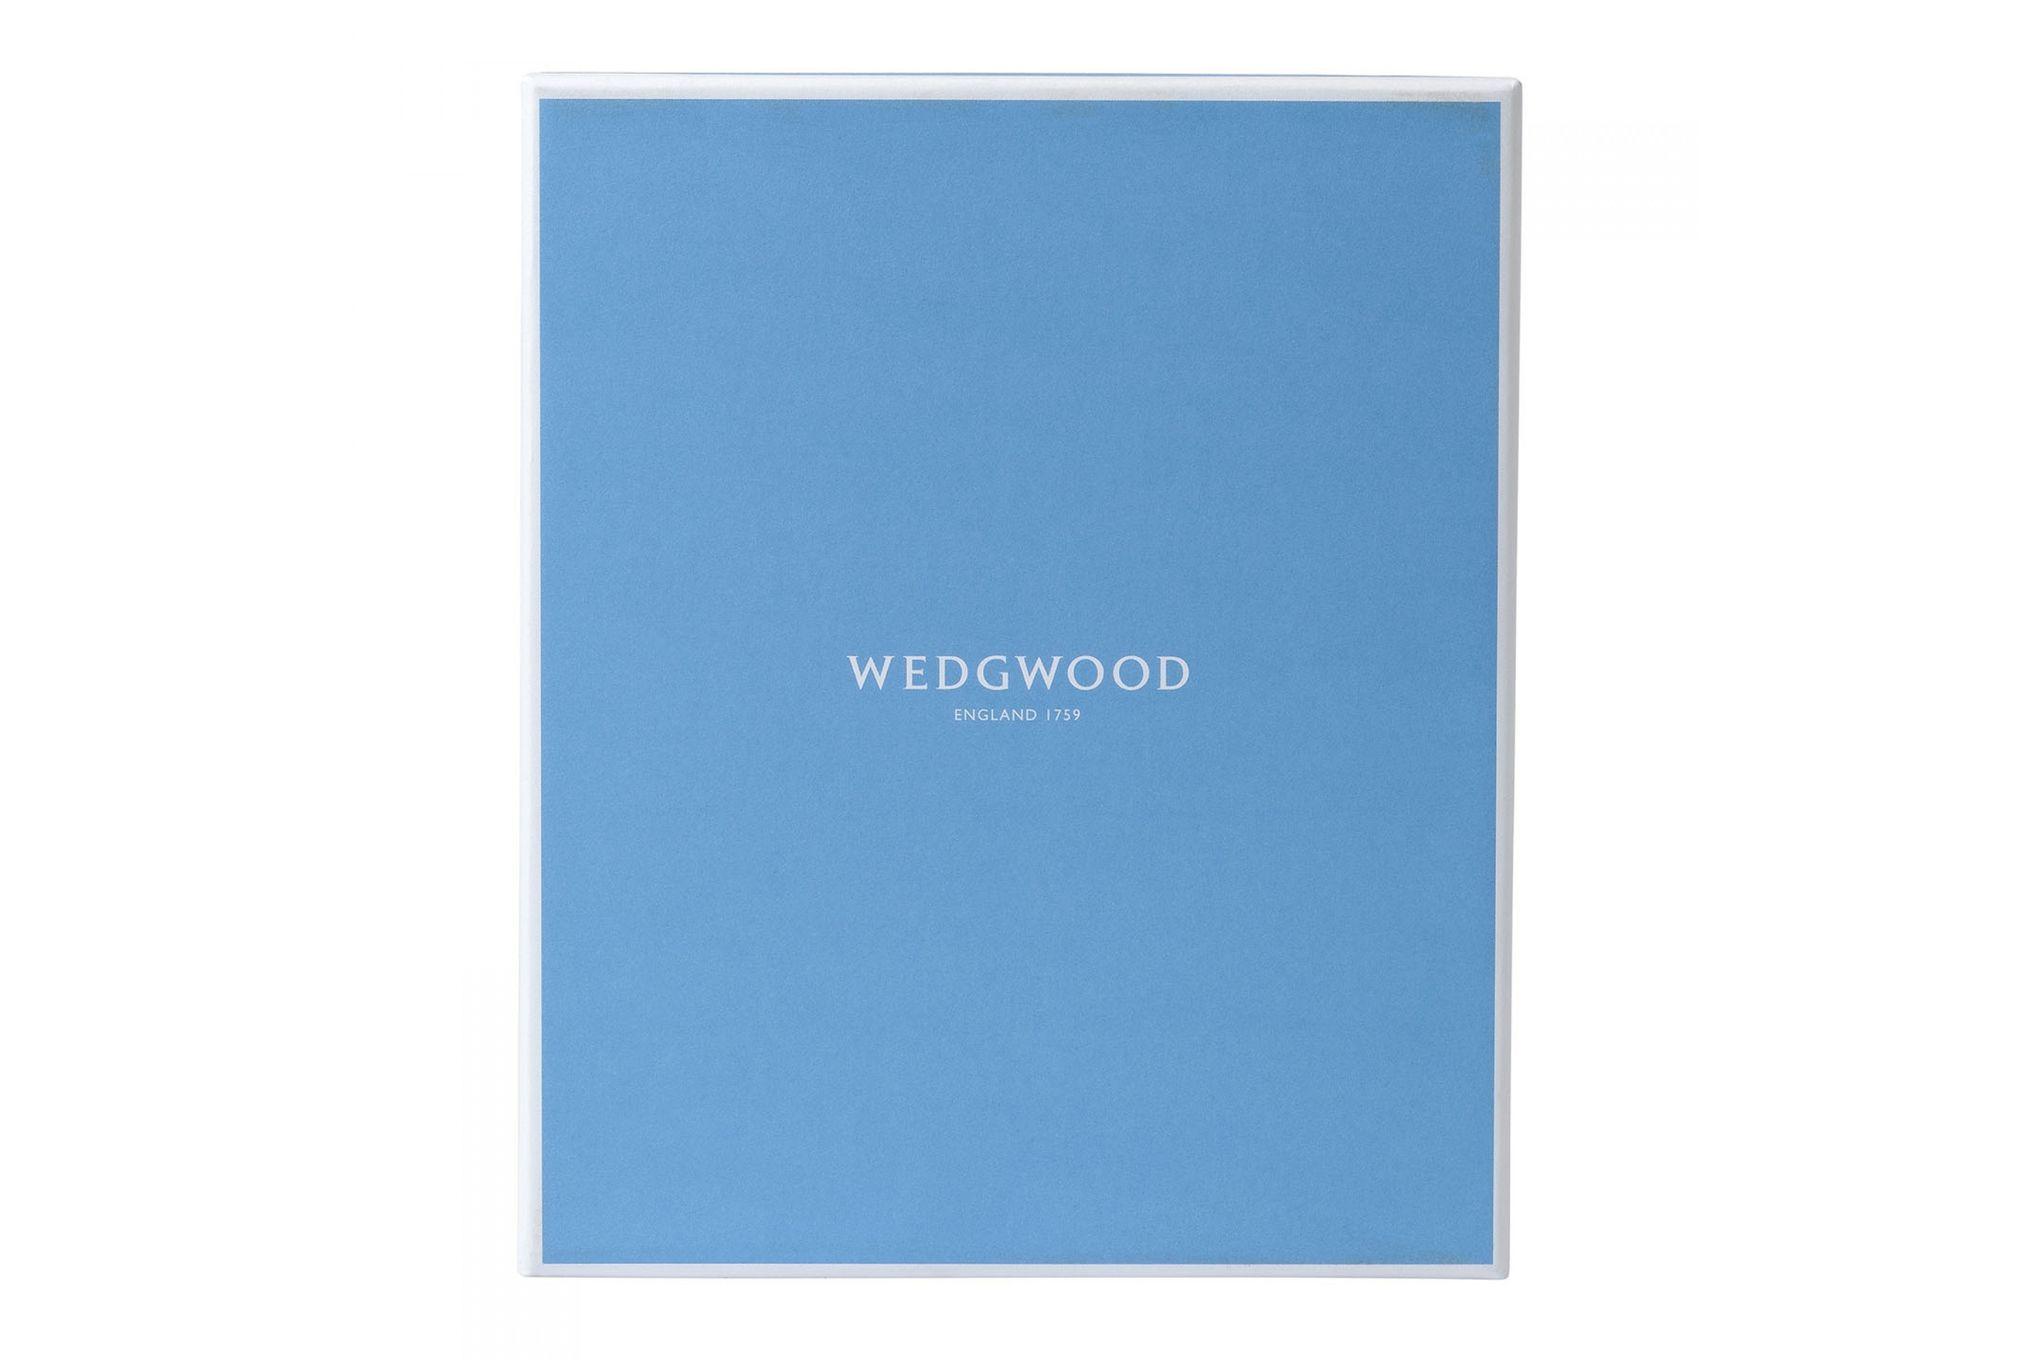 "Wedgwood Wonderlust Photo Frame Oriental Jewel - Boxed 4 x 6"" thumb 2"